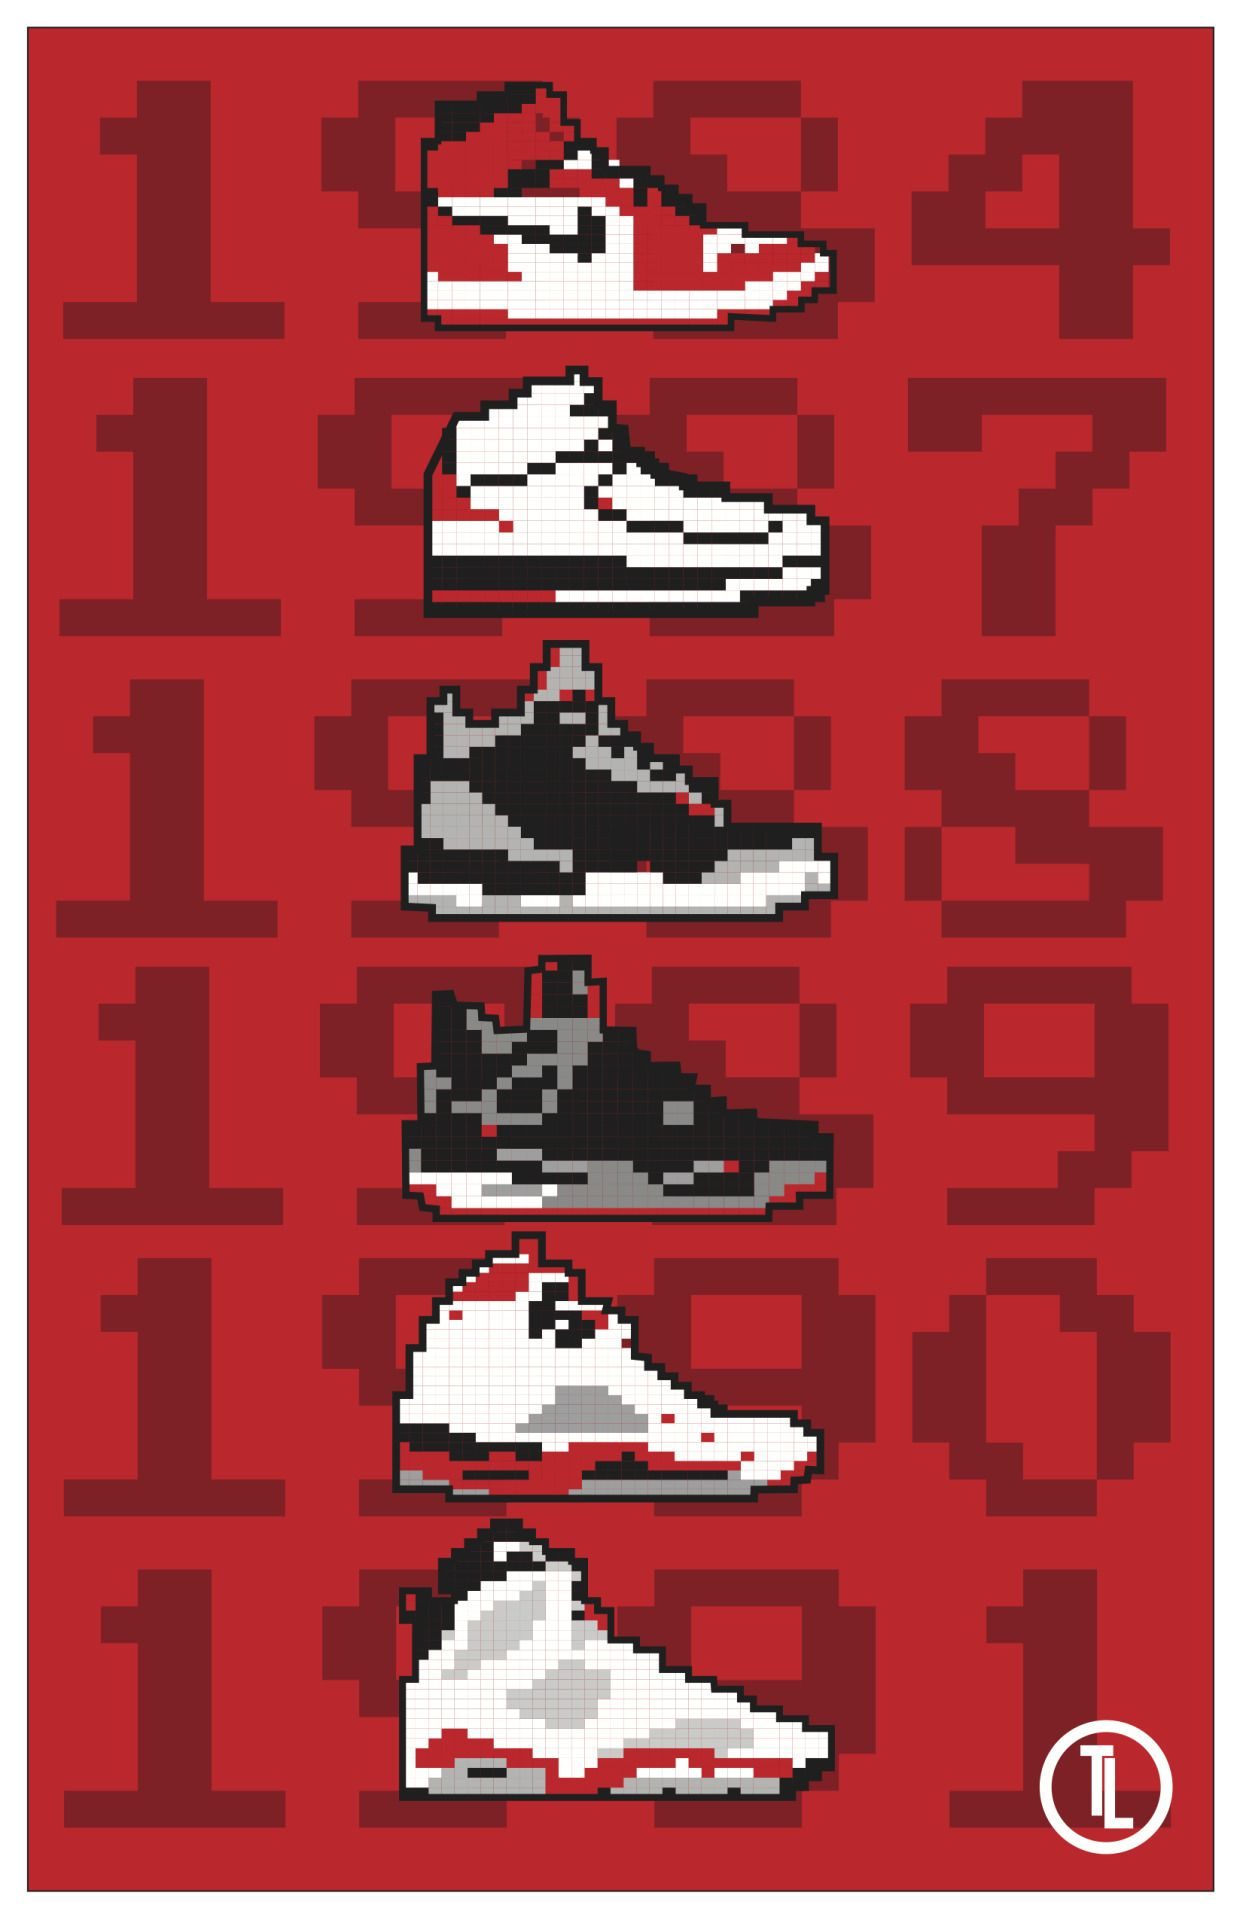 8Bit Jordan 16 Digital poster I designed. Prints